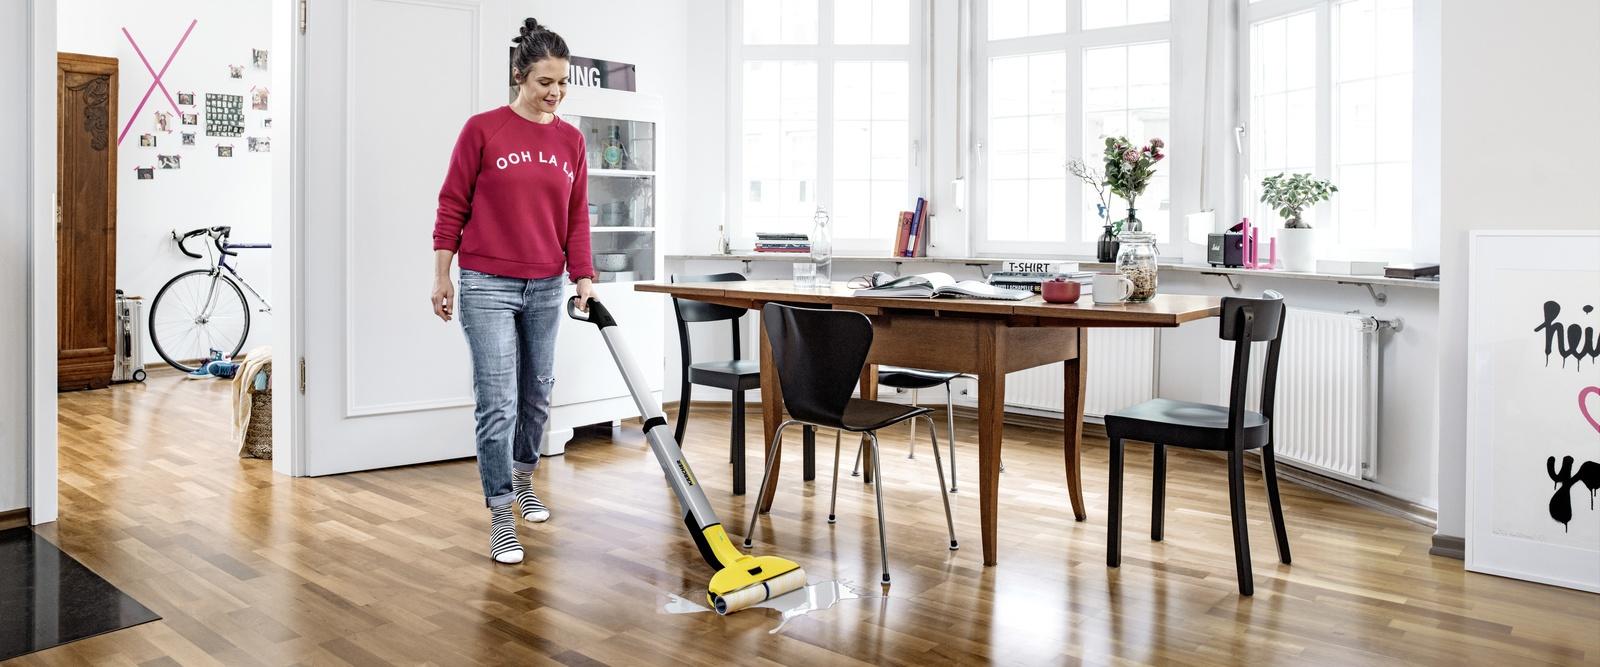 Wooden Floor Cleaning Kärcher International